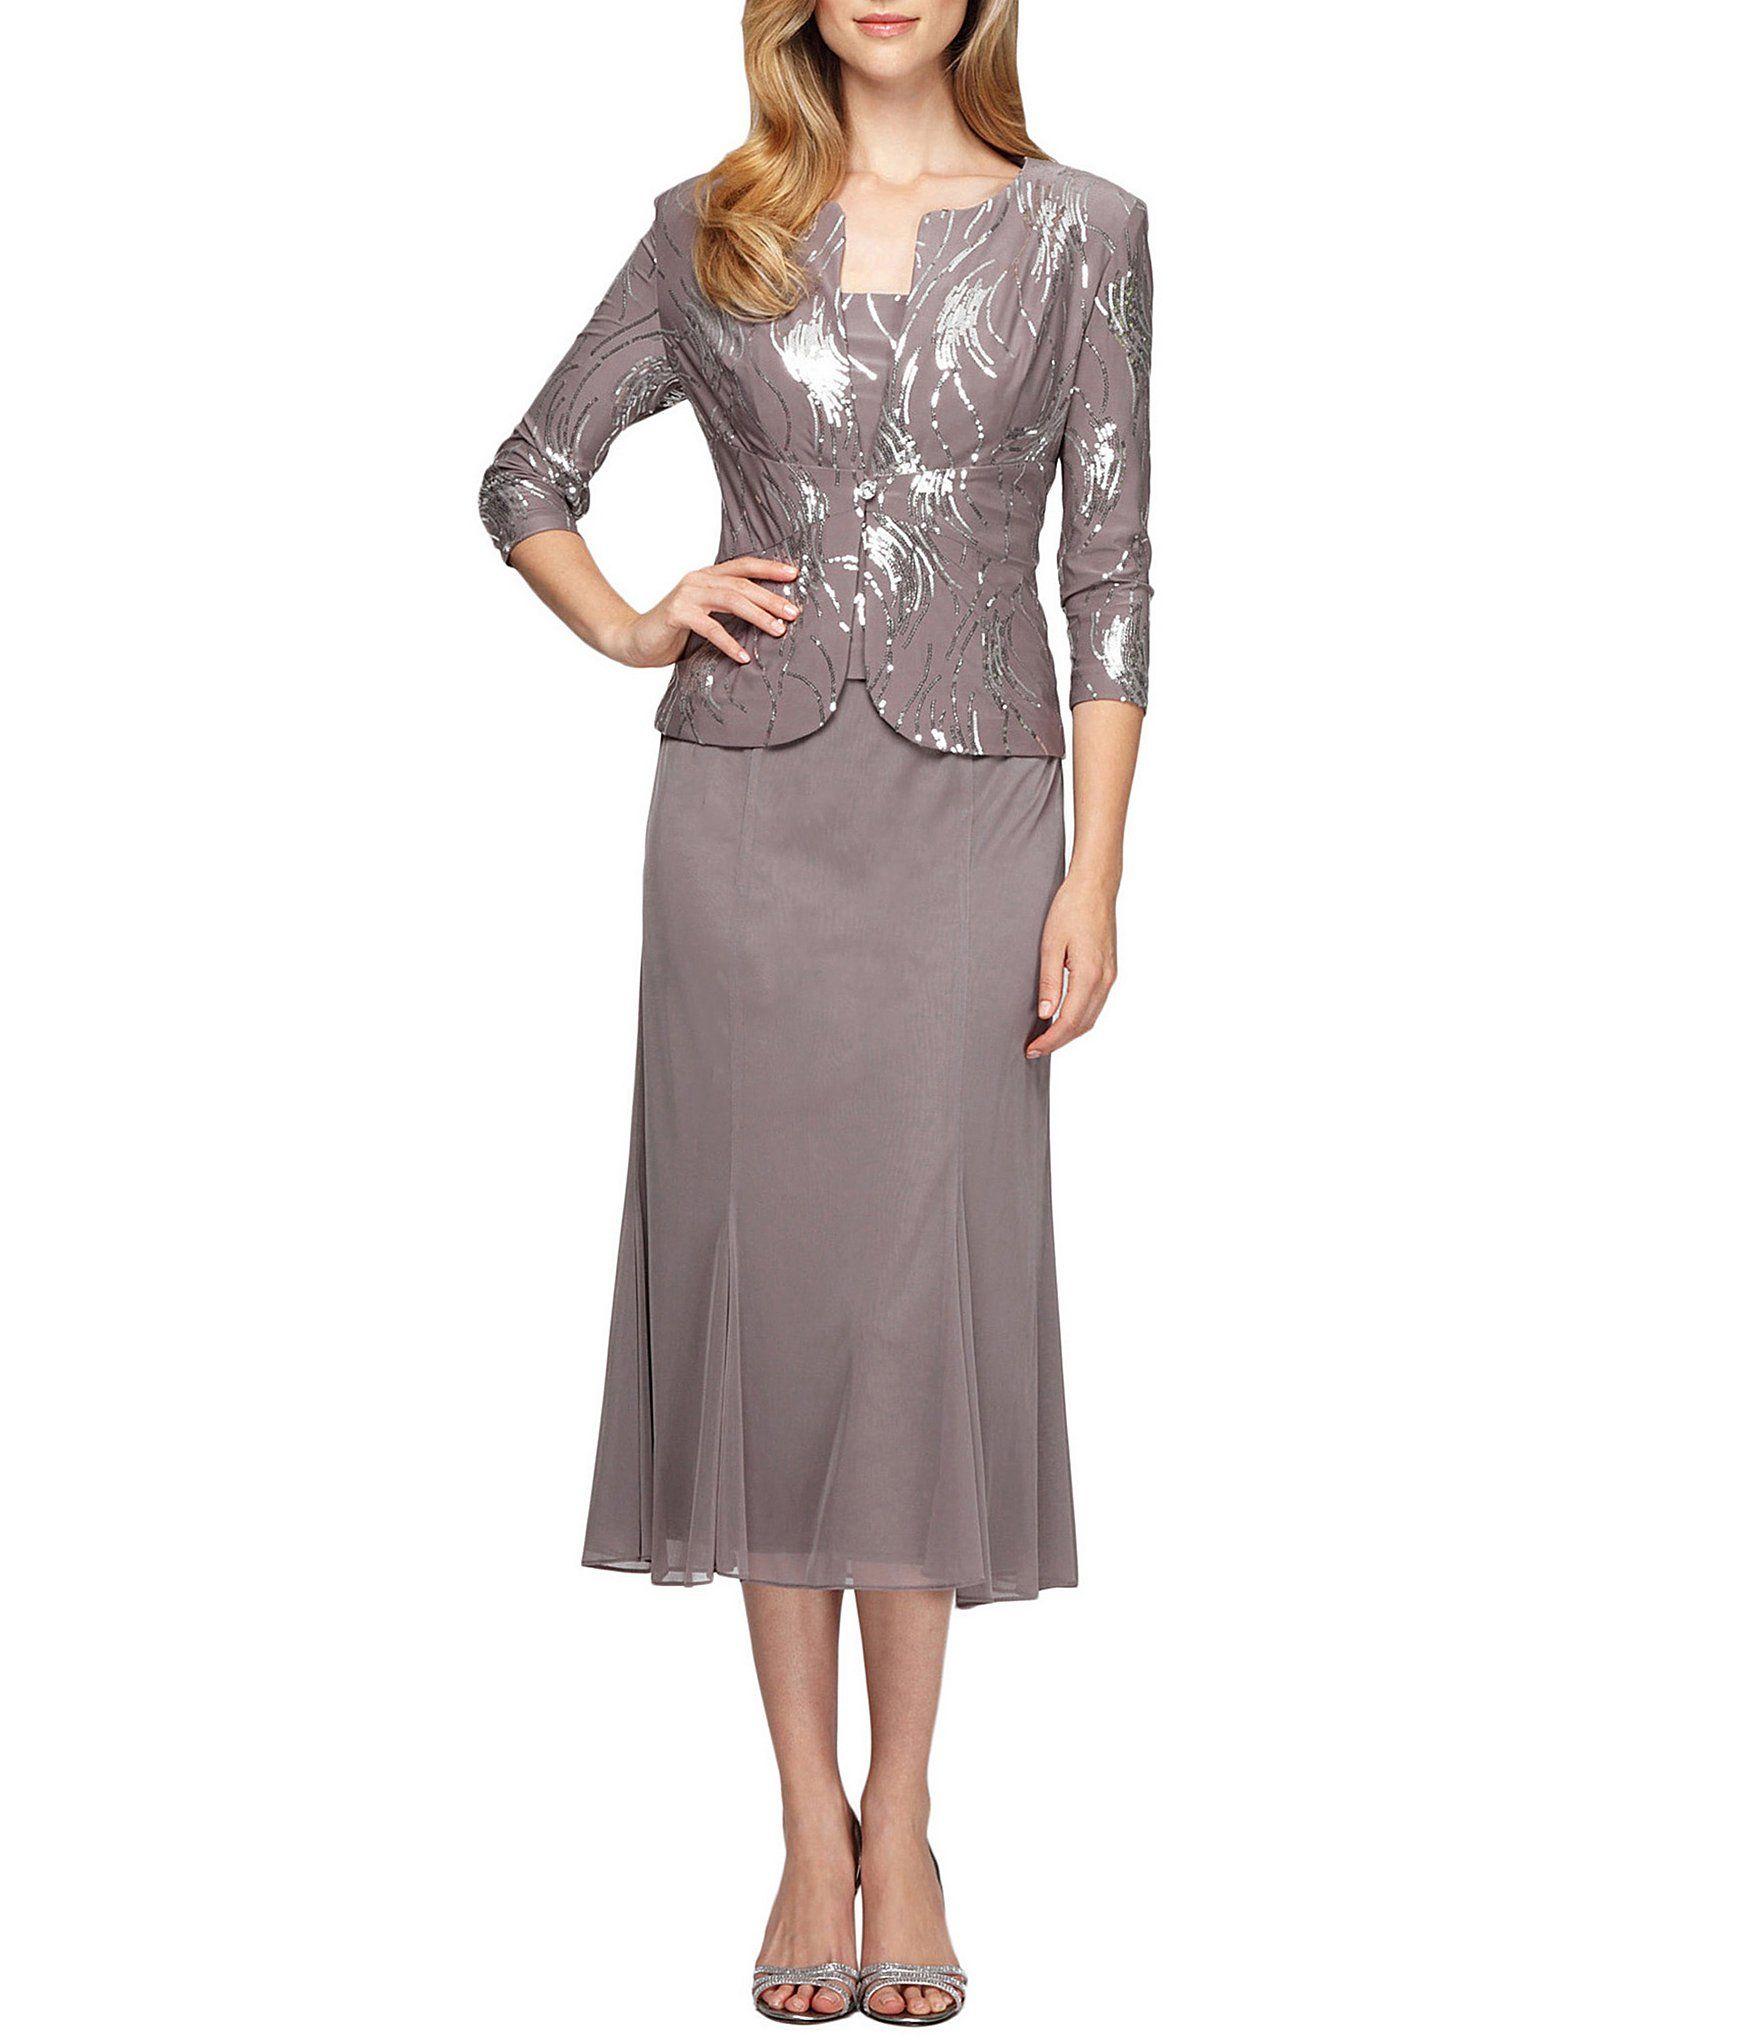 Alex Evenings Petite Sequin Bursts 2 Piece Tea Length Jacket Dress Dillard S Evening Midi Dress Shrug For Dresses Midi Dress Sleeveless [ 2040 x 1760 Pixel ]